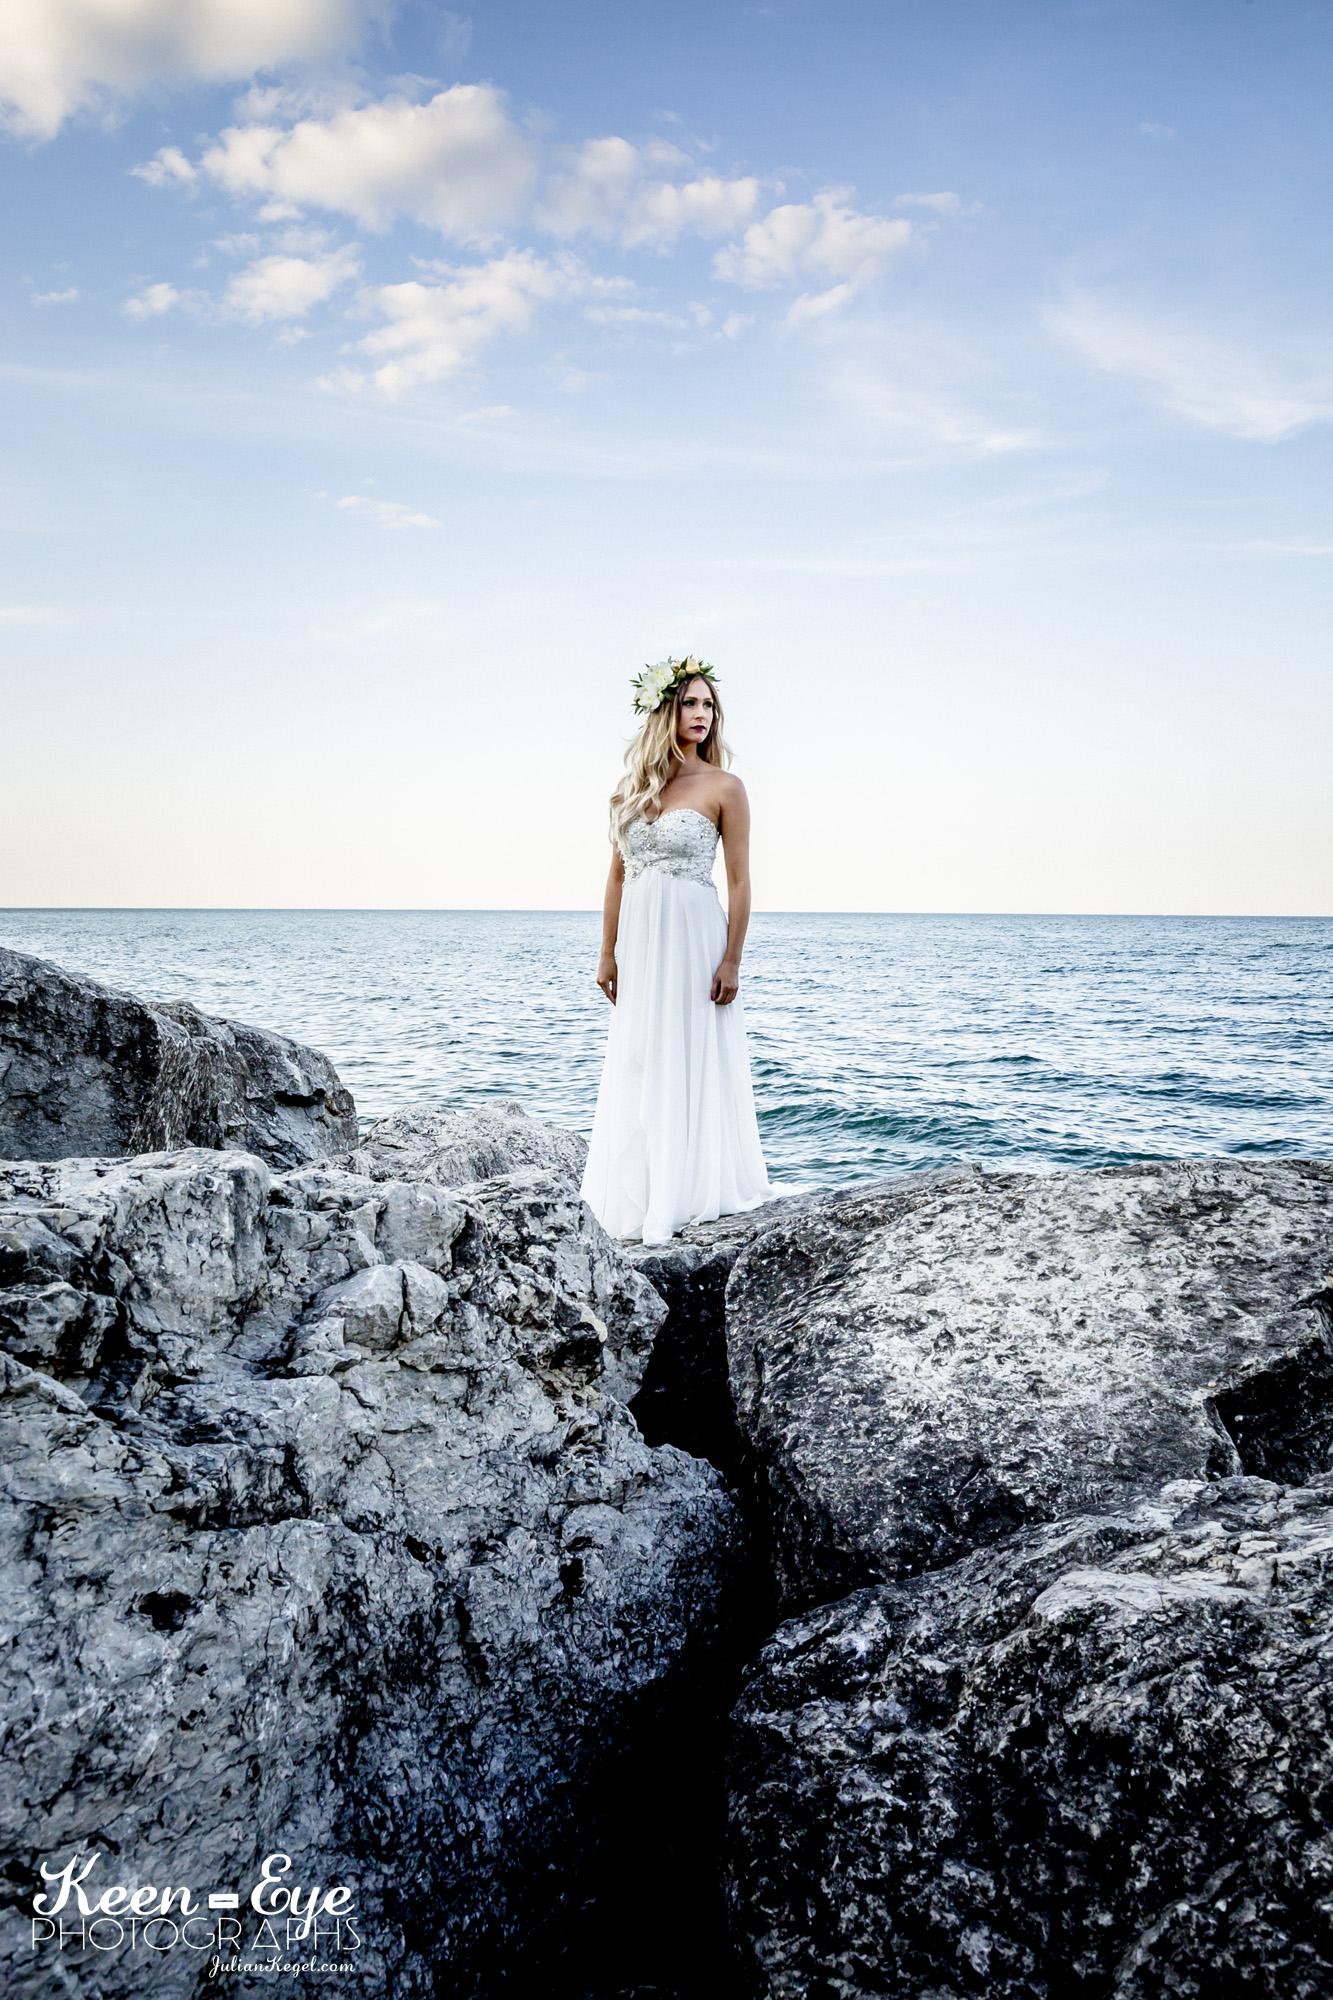 Ditch the dress_KrissyOleson_2017 (8).jpg